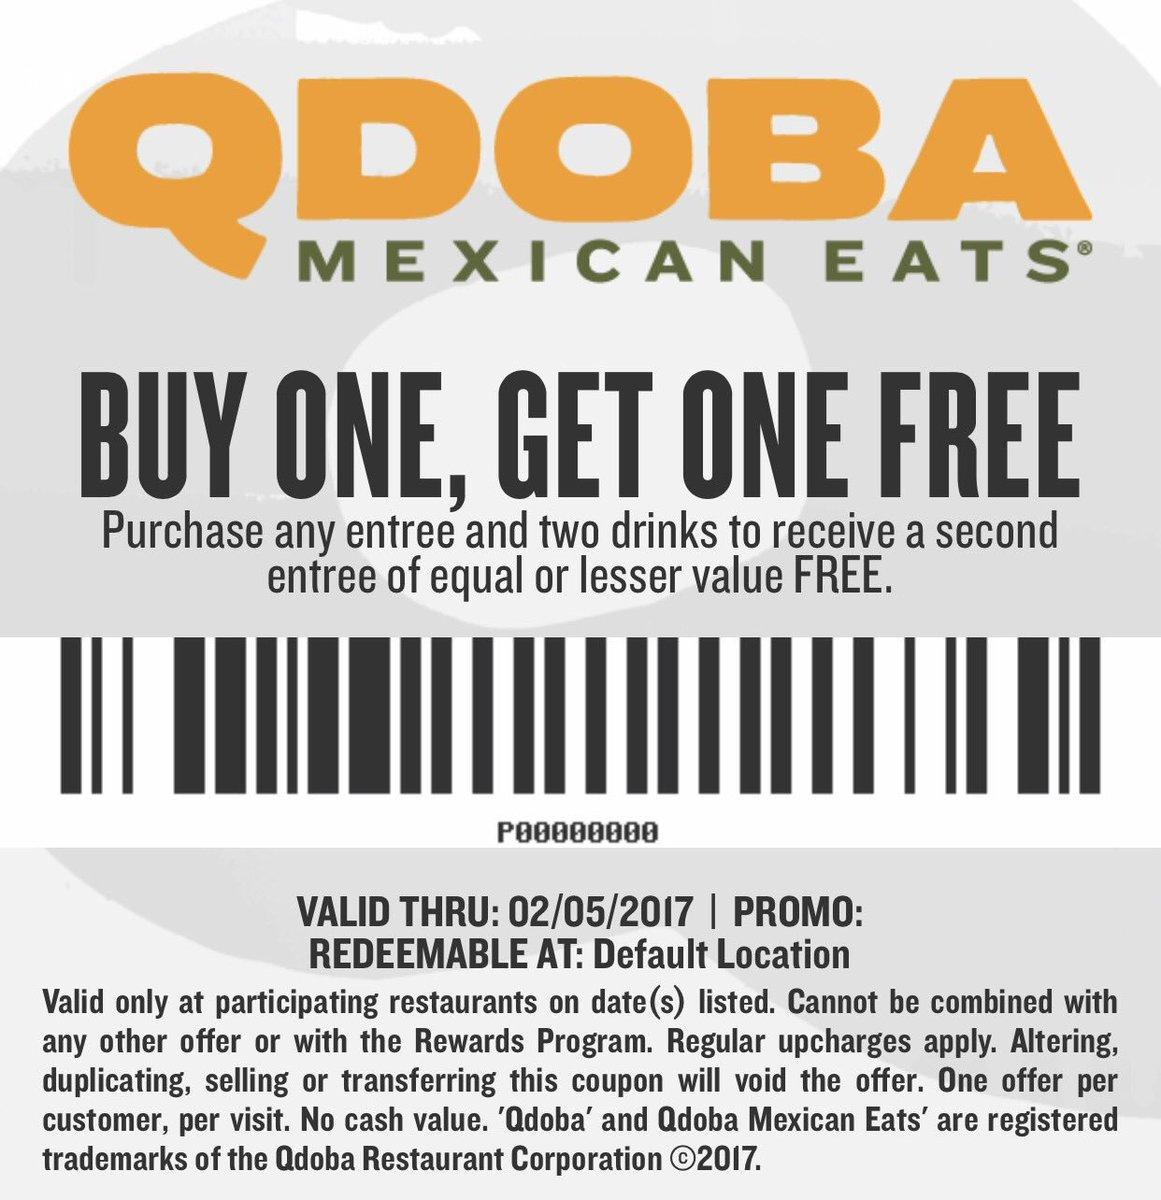 Qdoba Online Coupons | Printable Coupons Online - Bogo Free Coupons Printable